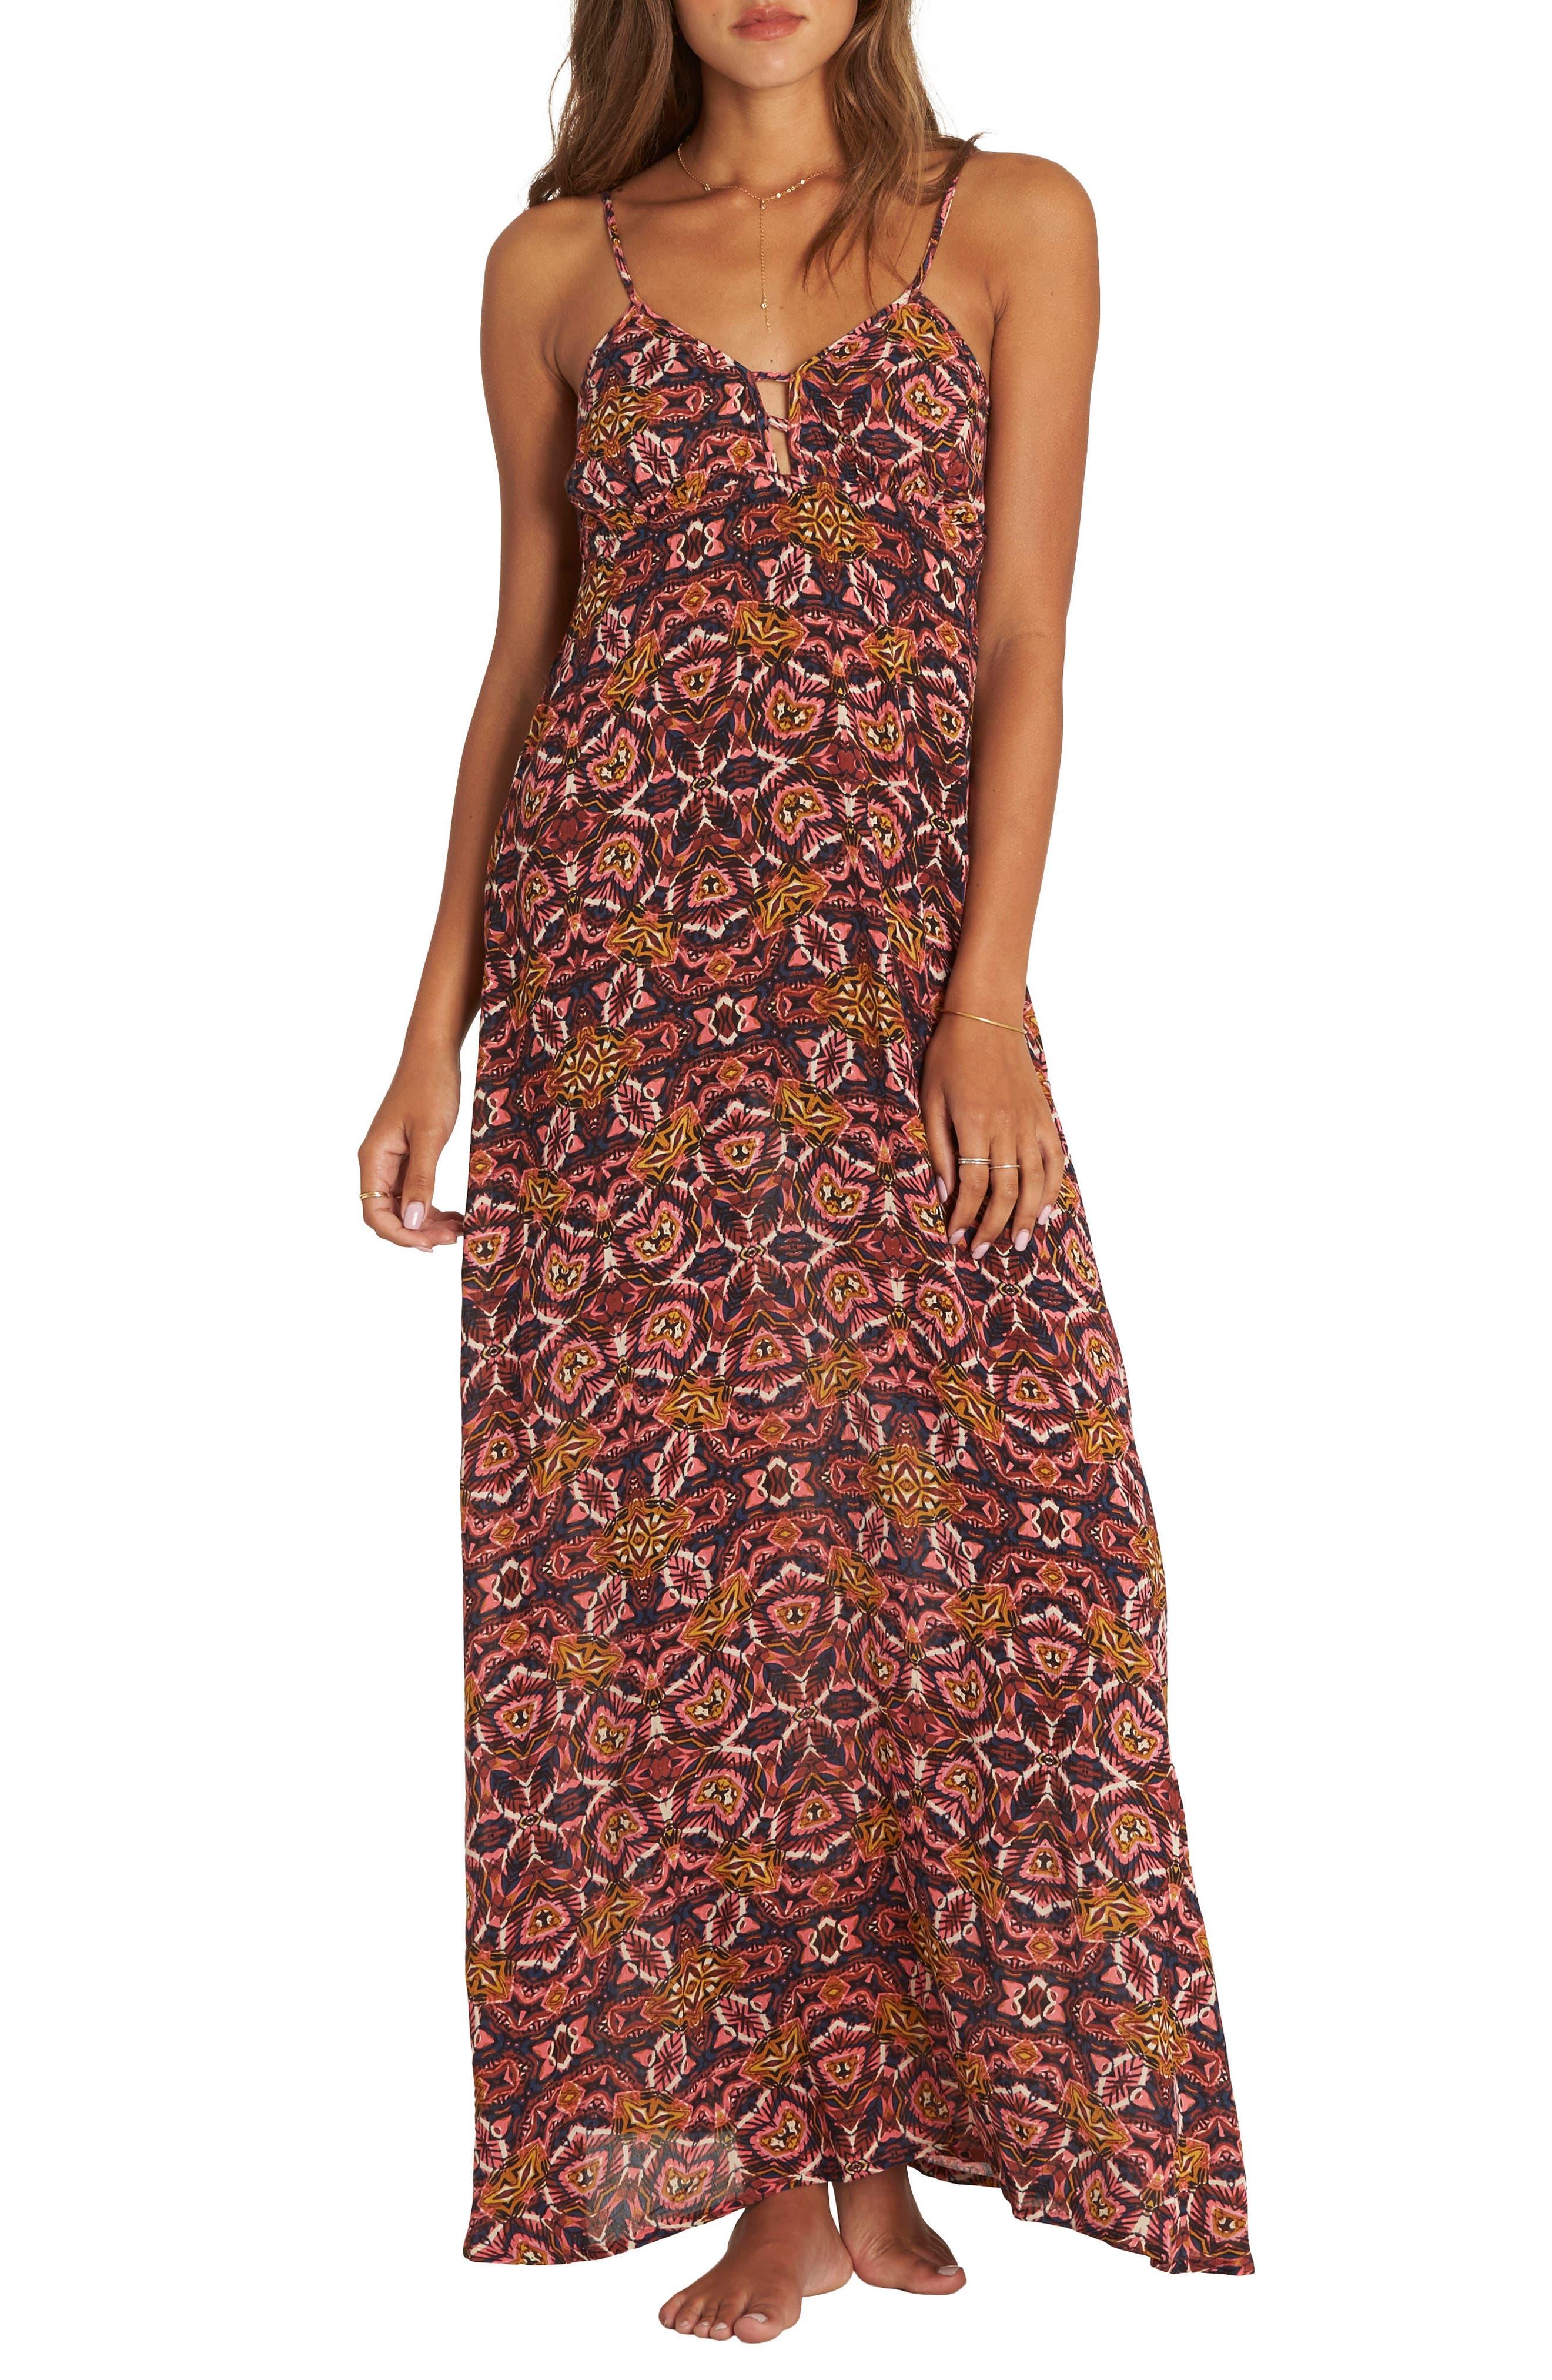 Sky On Fire Maxi Dress,                             Main thumbnail 1, color,                             Multi